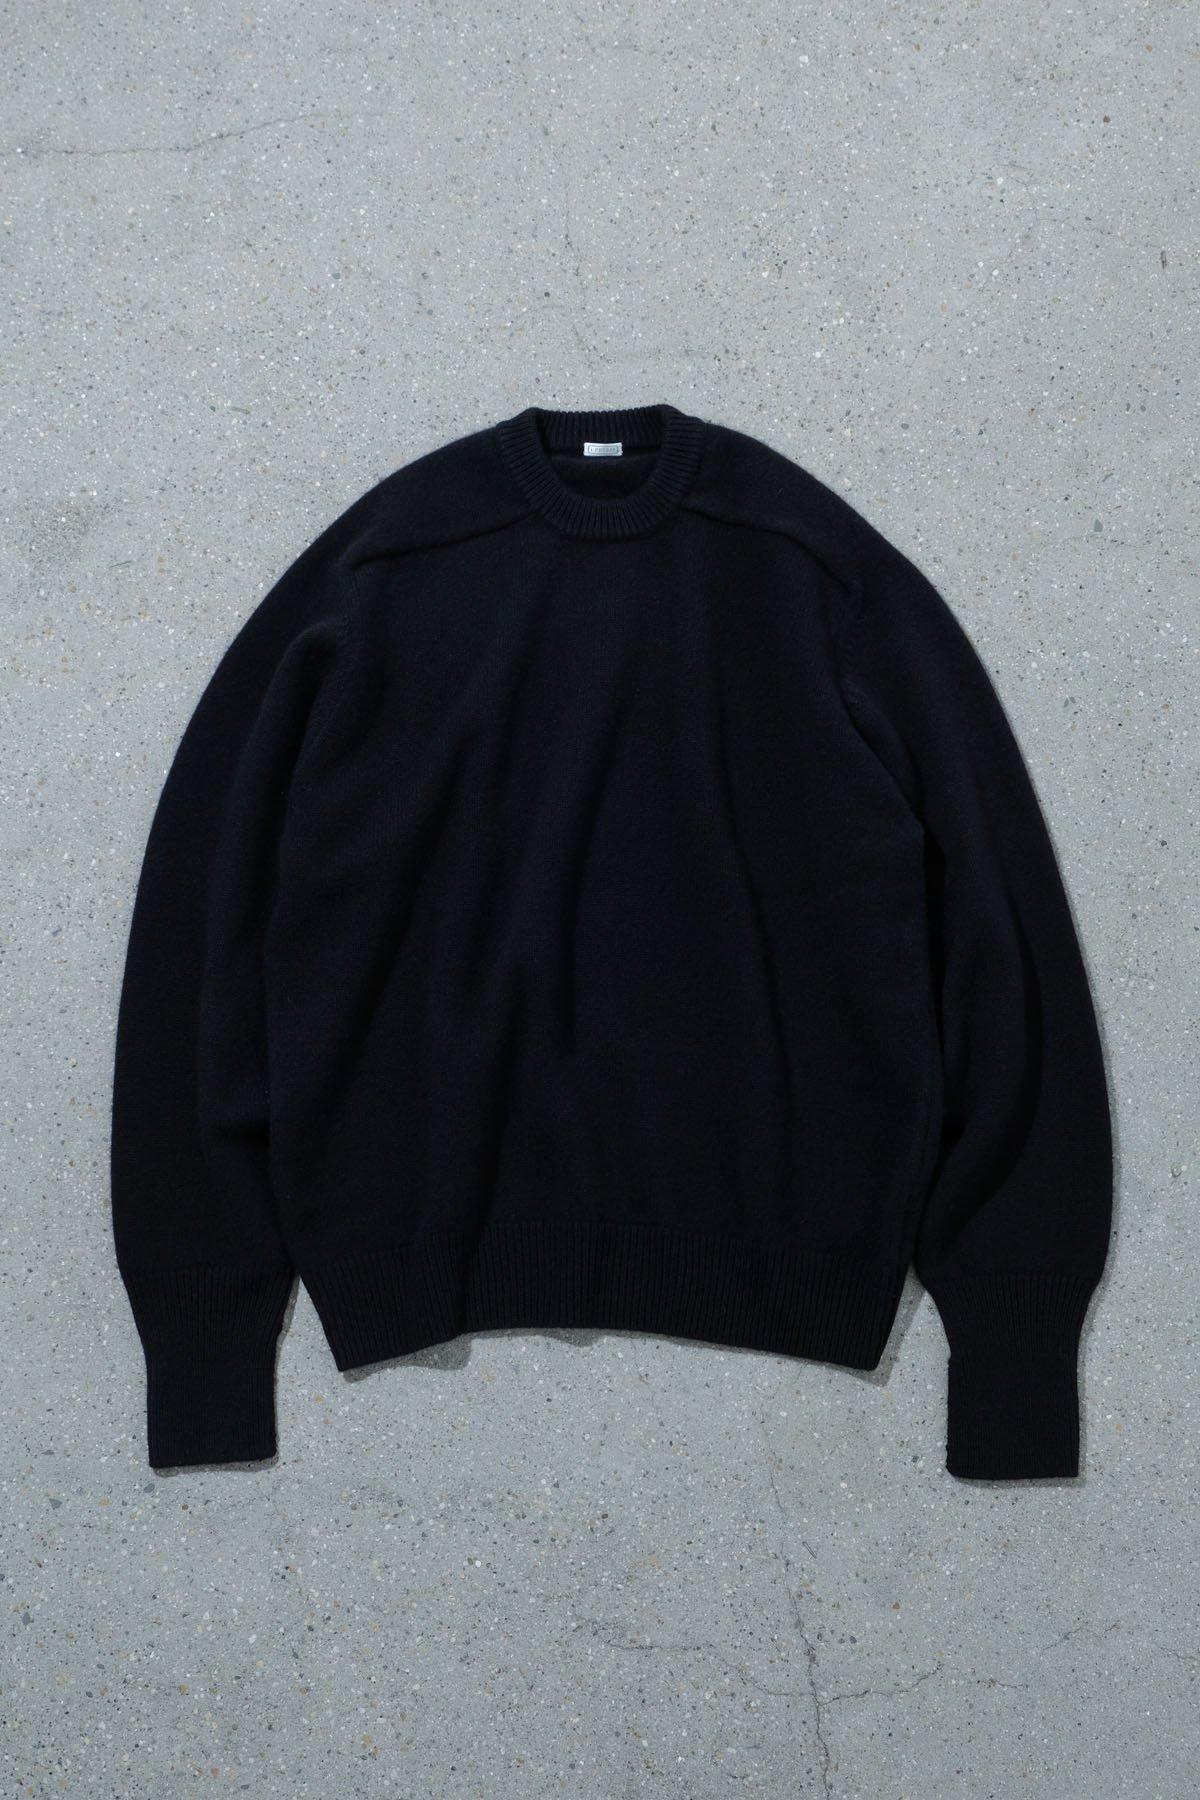 A.PRESSE / Pullover Sweater